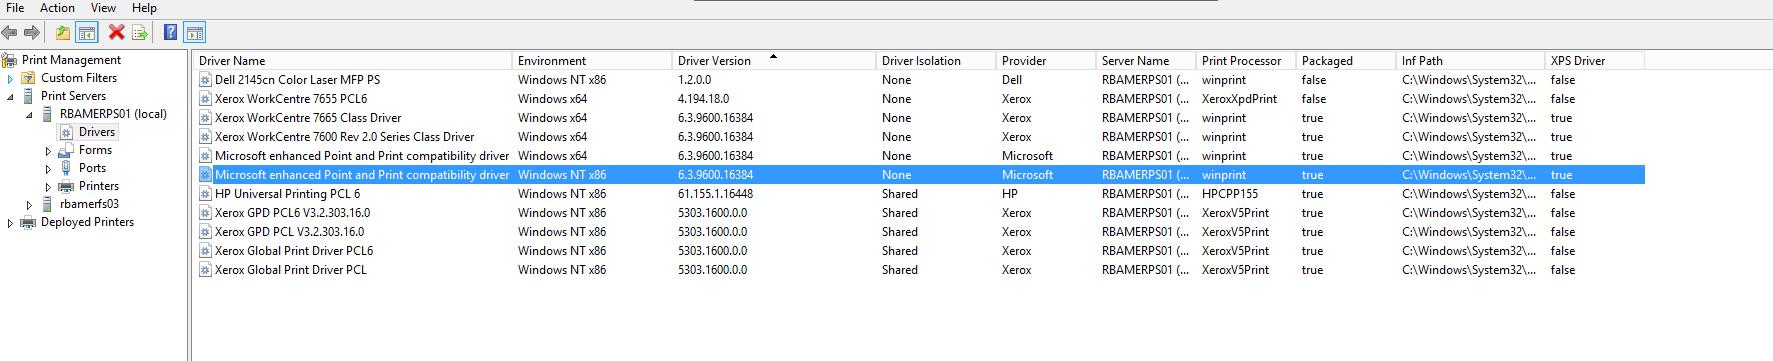 Hp universal print driver windows 7 32 bit download -  vinny. Oleo.